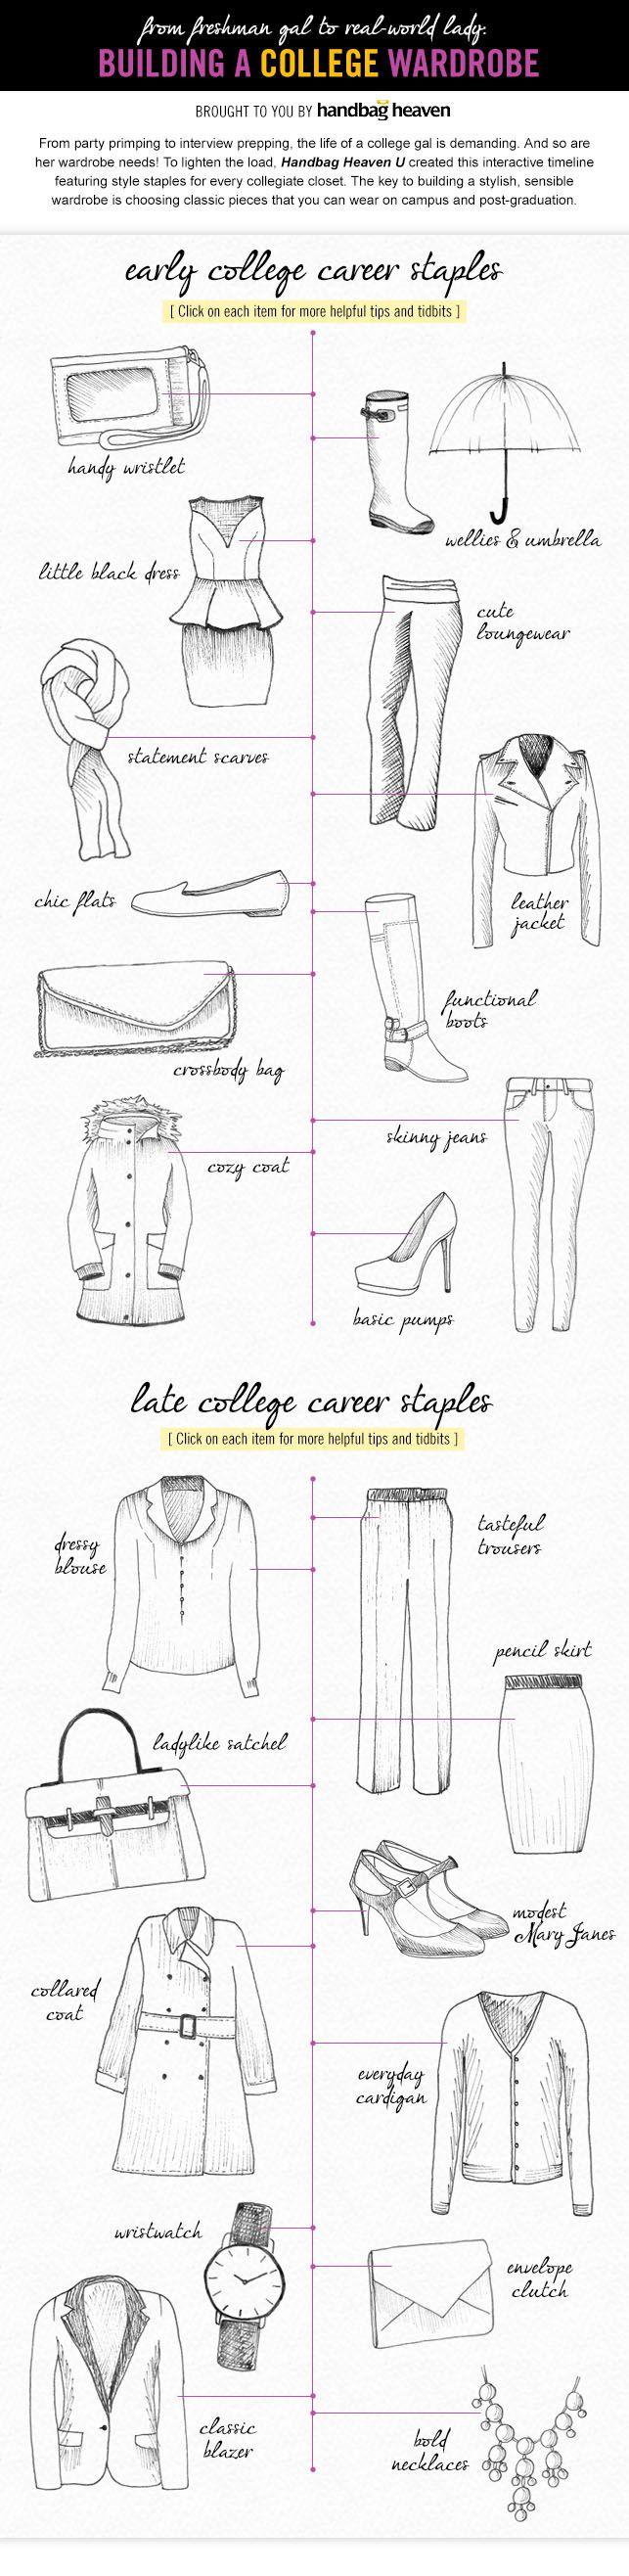 How to build a college wardrobe via @handbagheaven www.handbagheaven...